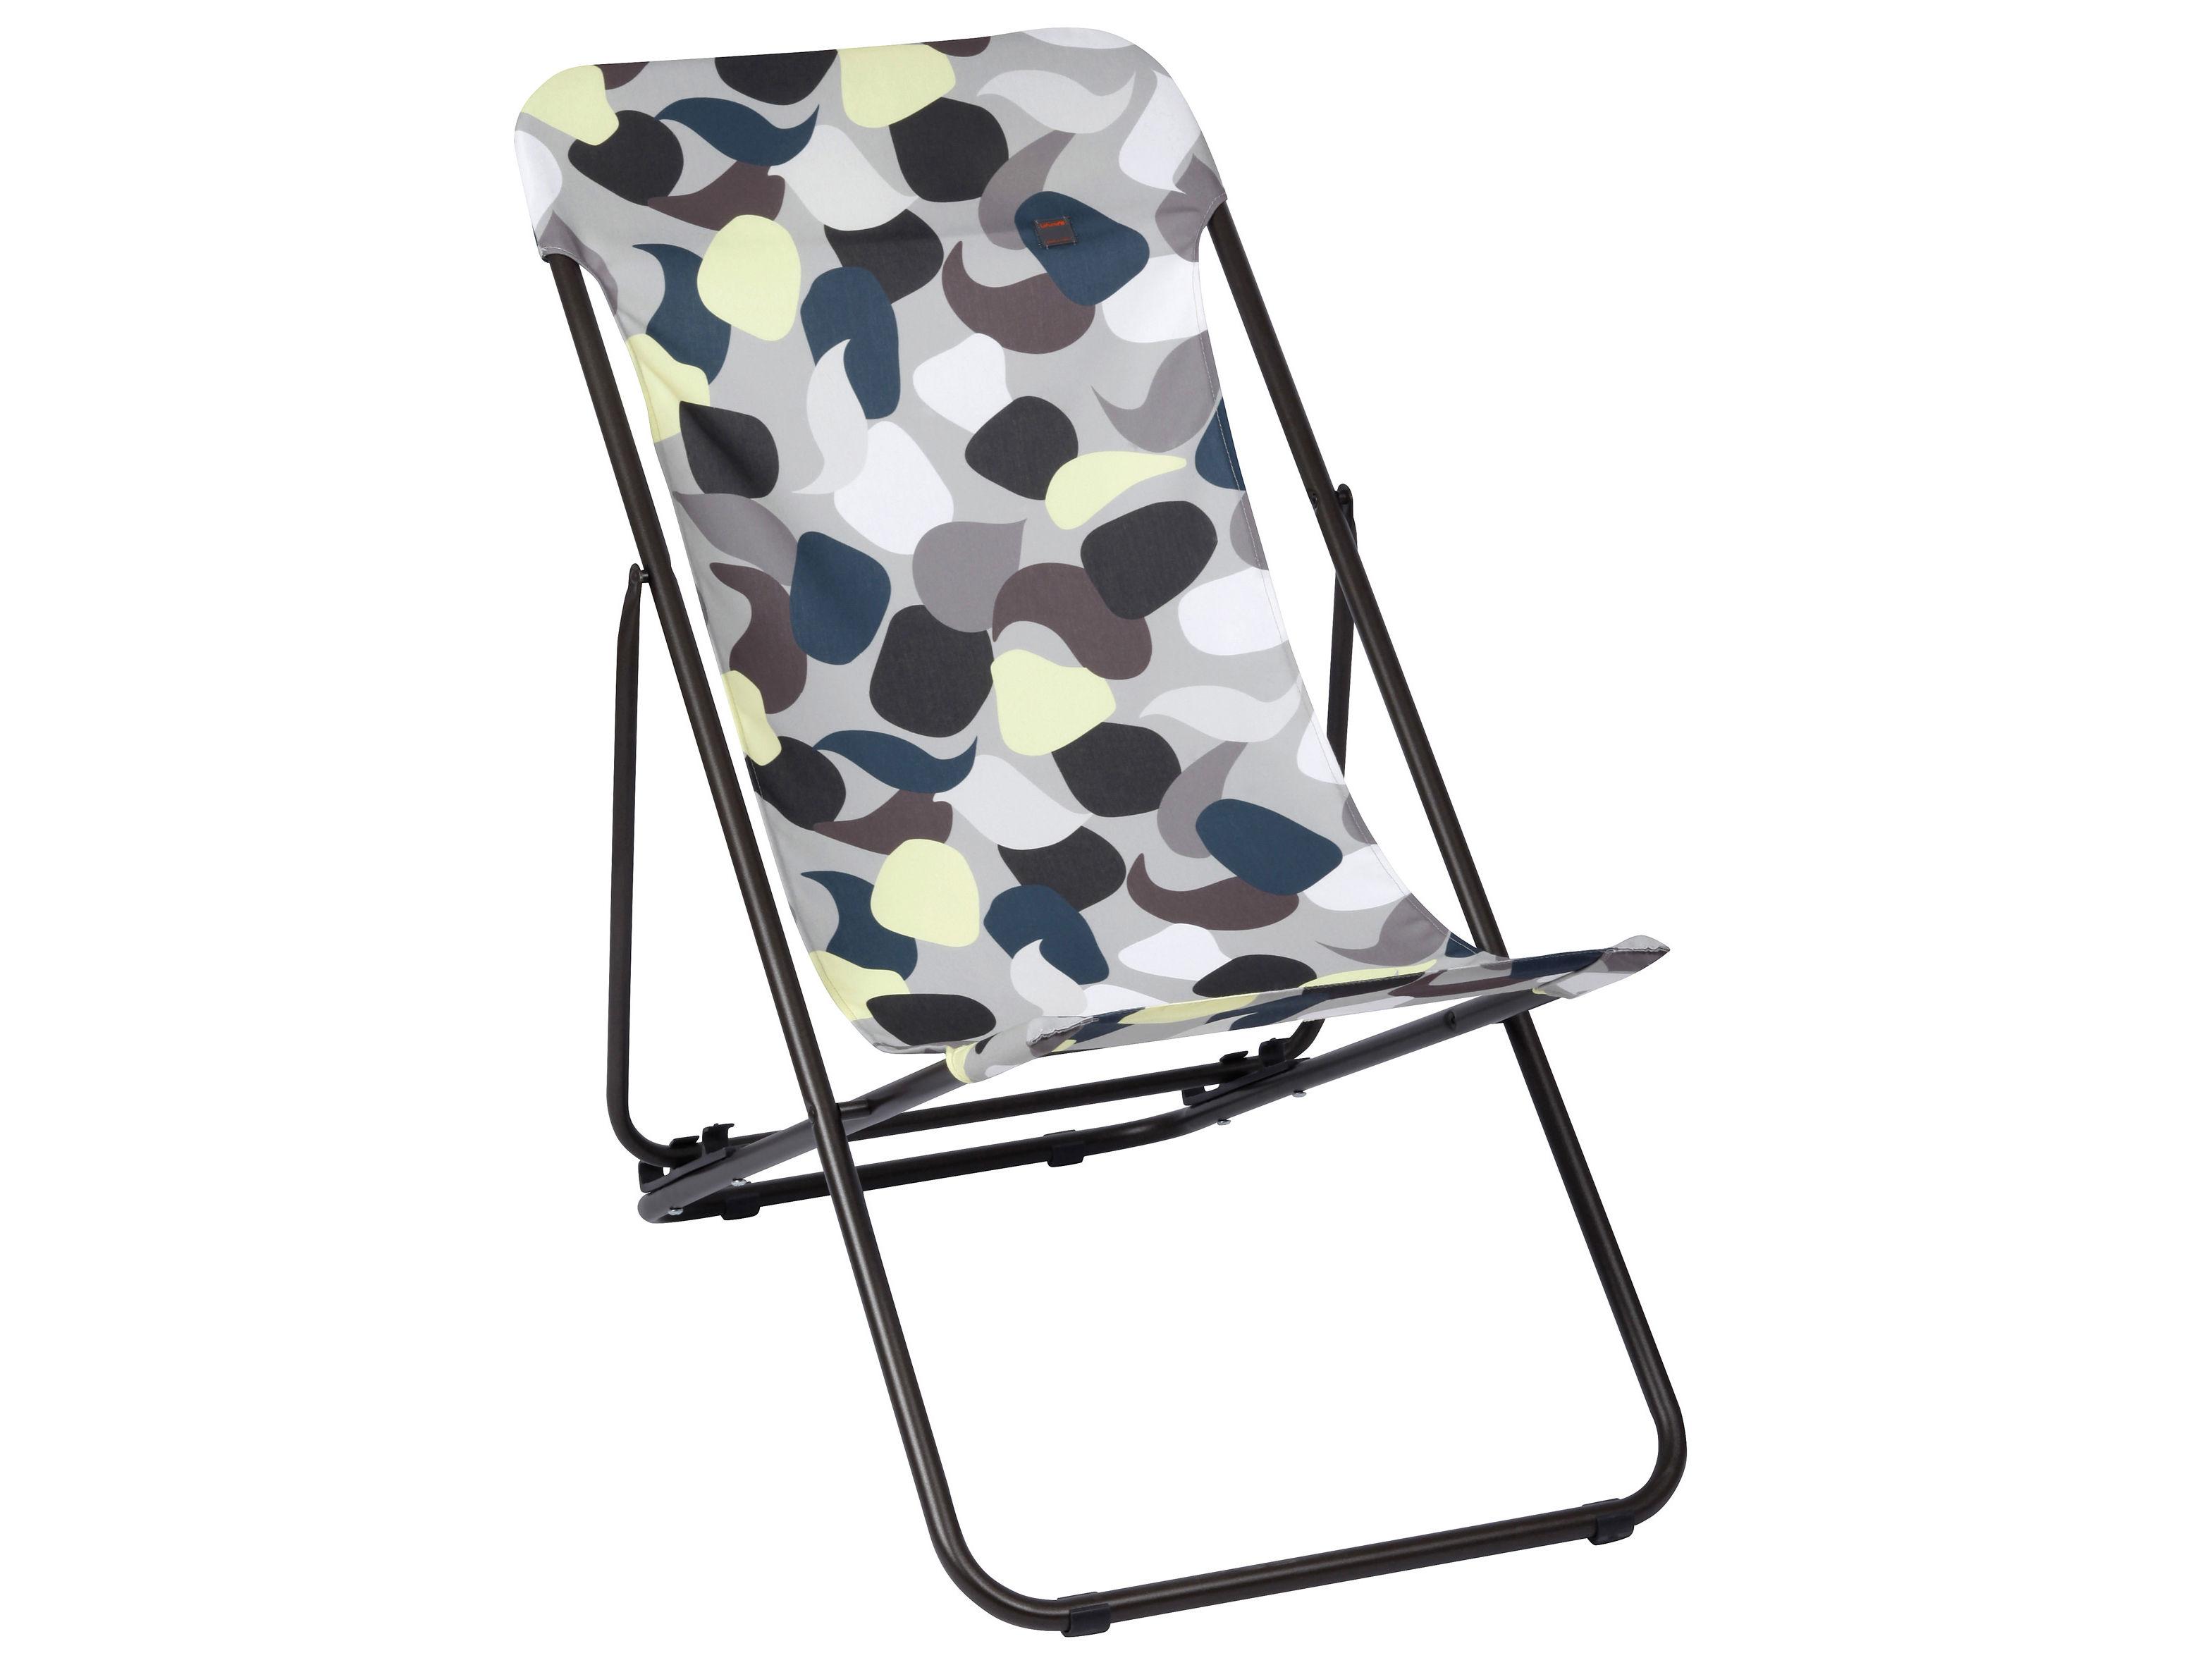 chaise longue transatube pliable 3 positions tango. Black Bedroom Furniture Sets. Home Design Ideas